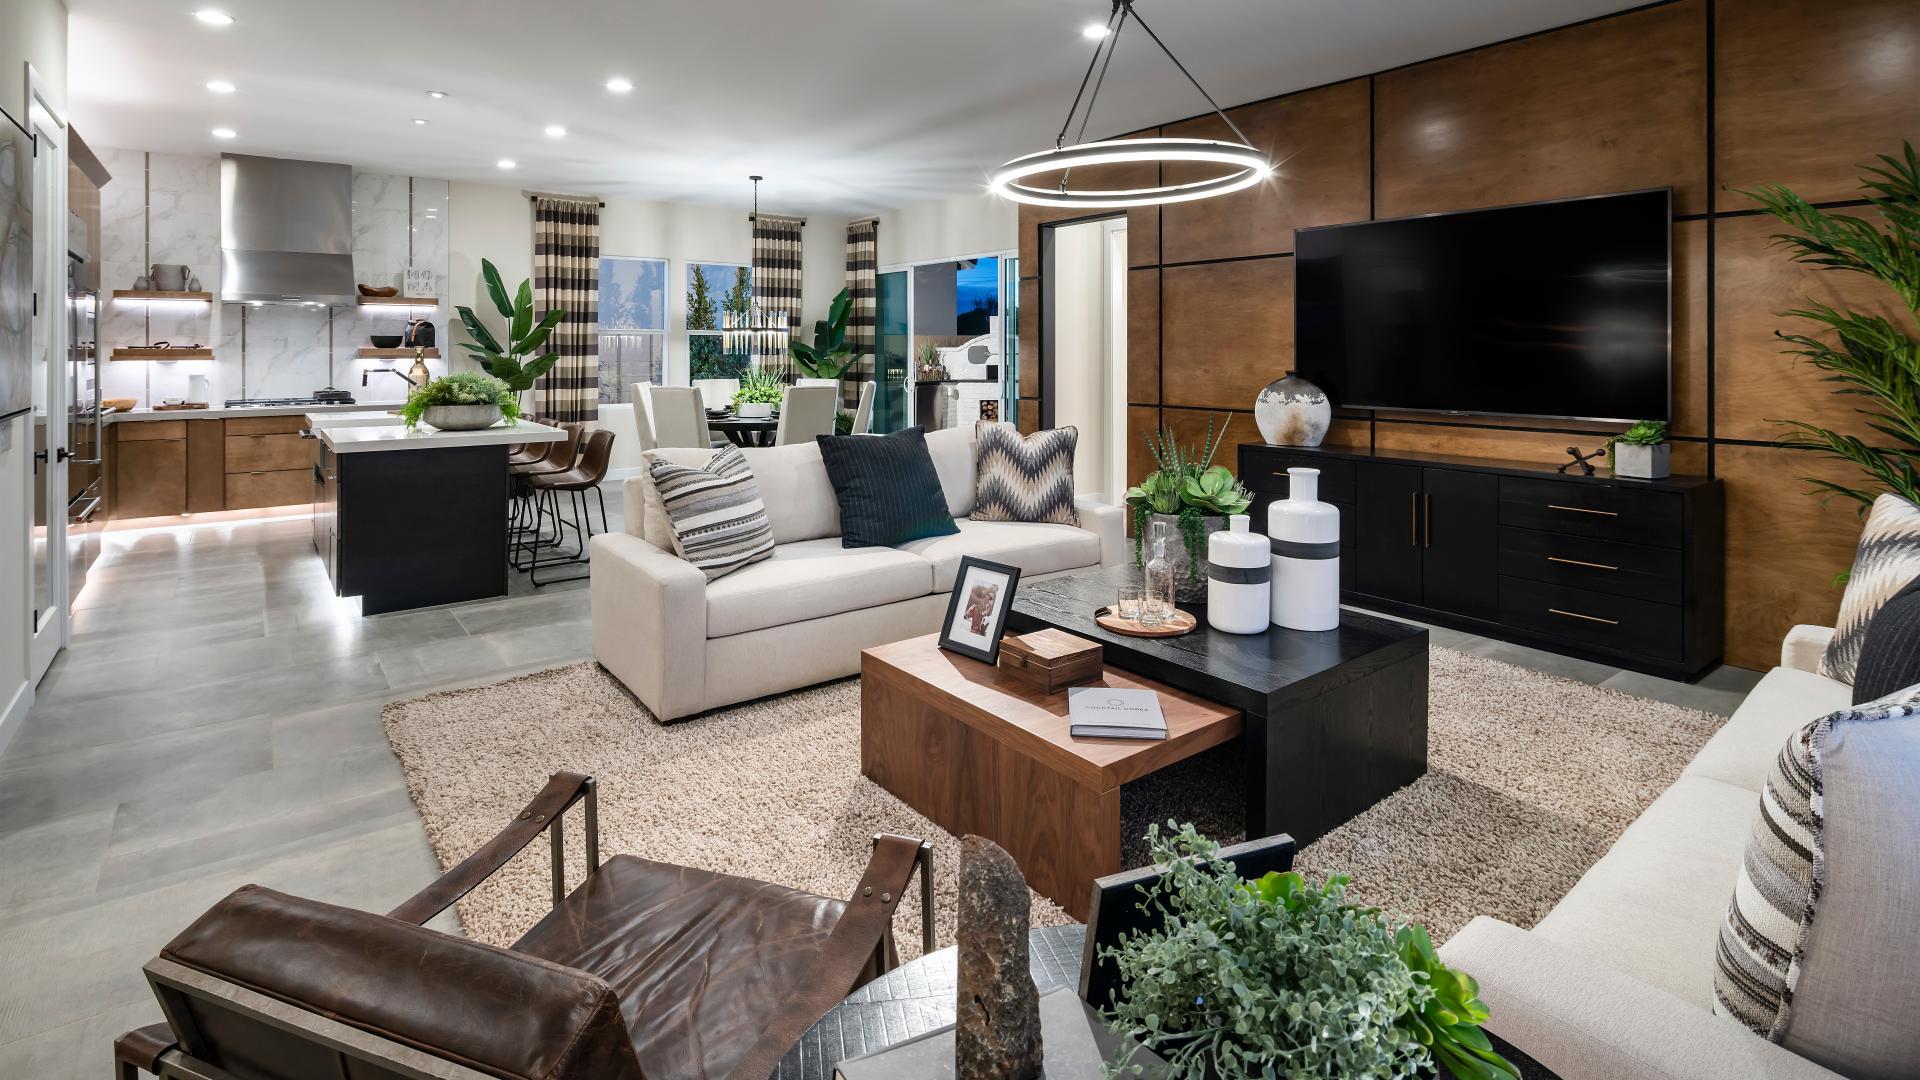 Open-concept great room